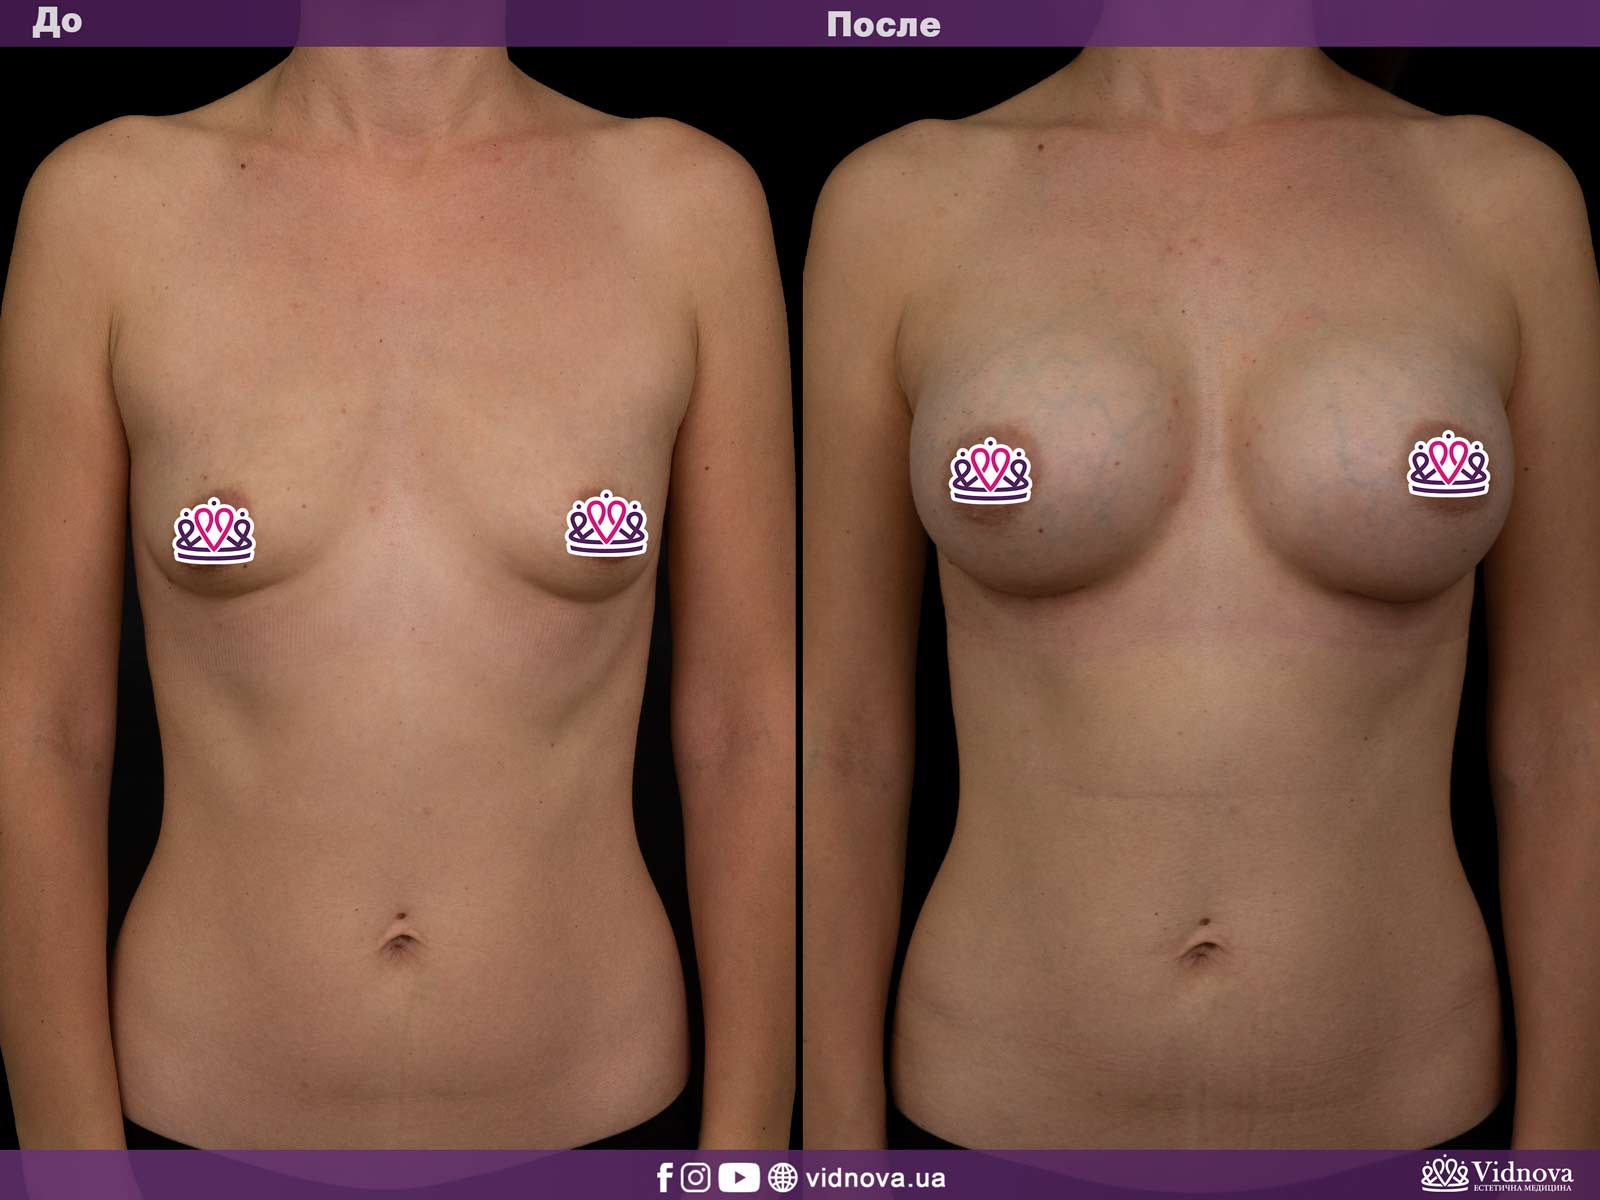 Увеличение груди: Фото ДО и ПОСЛЕ - Пример №8-1 - Клиника Vidnova